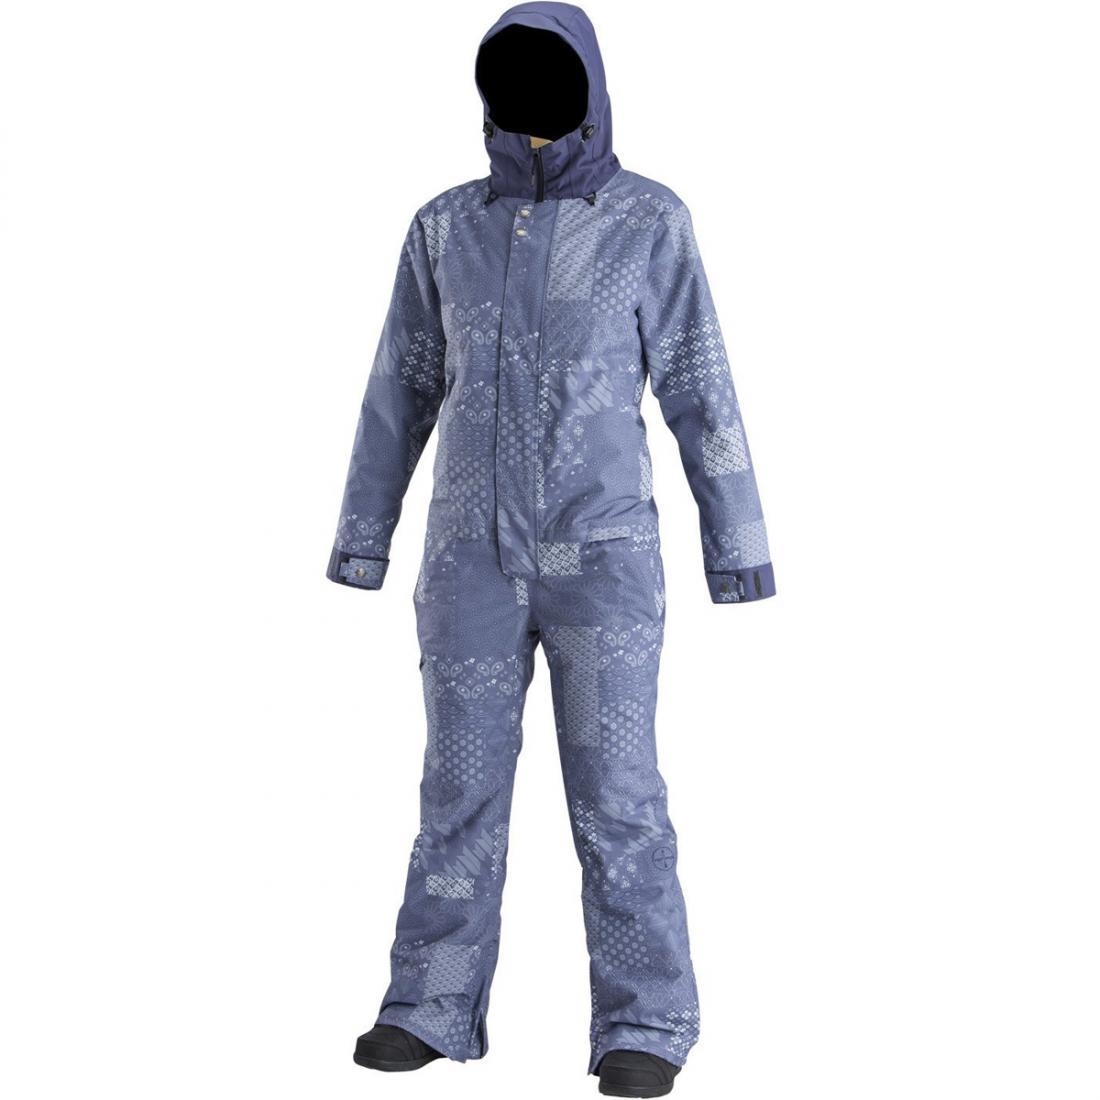 Сноубордический комбинезон Airblaster Womens Insulated Freedom Suit купить в Boardshop №1